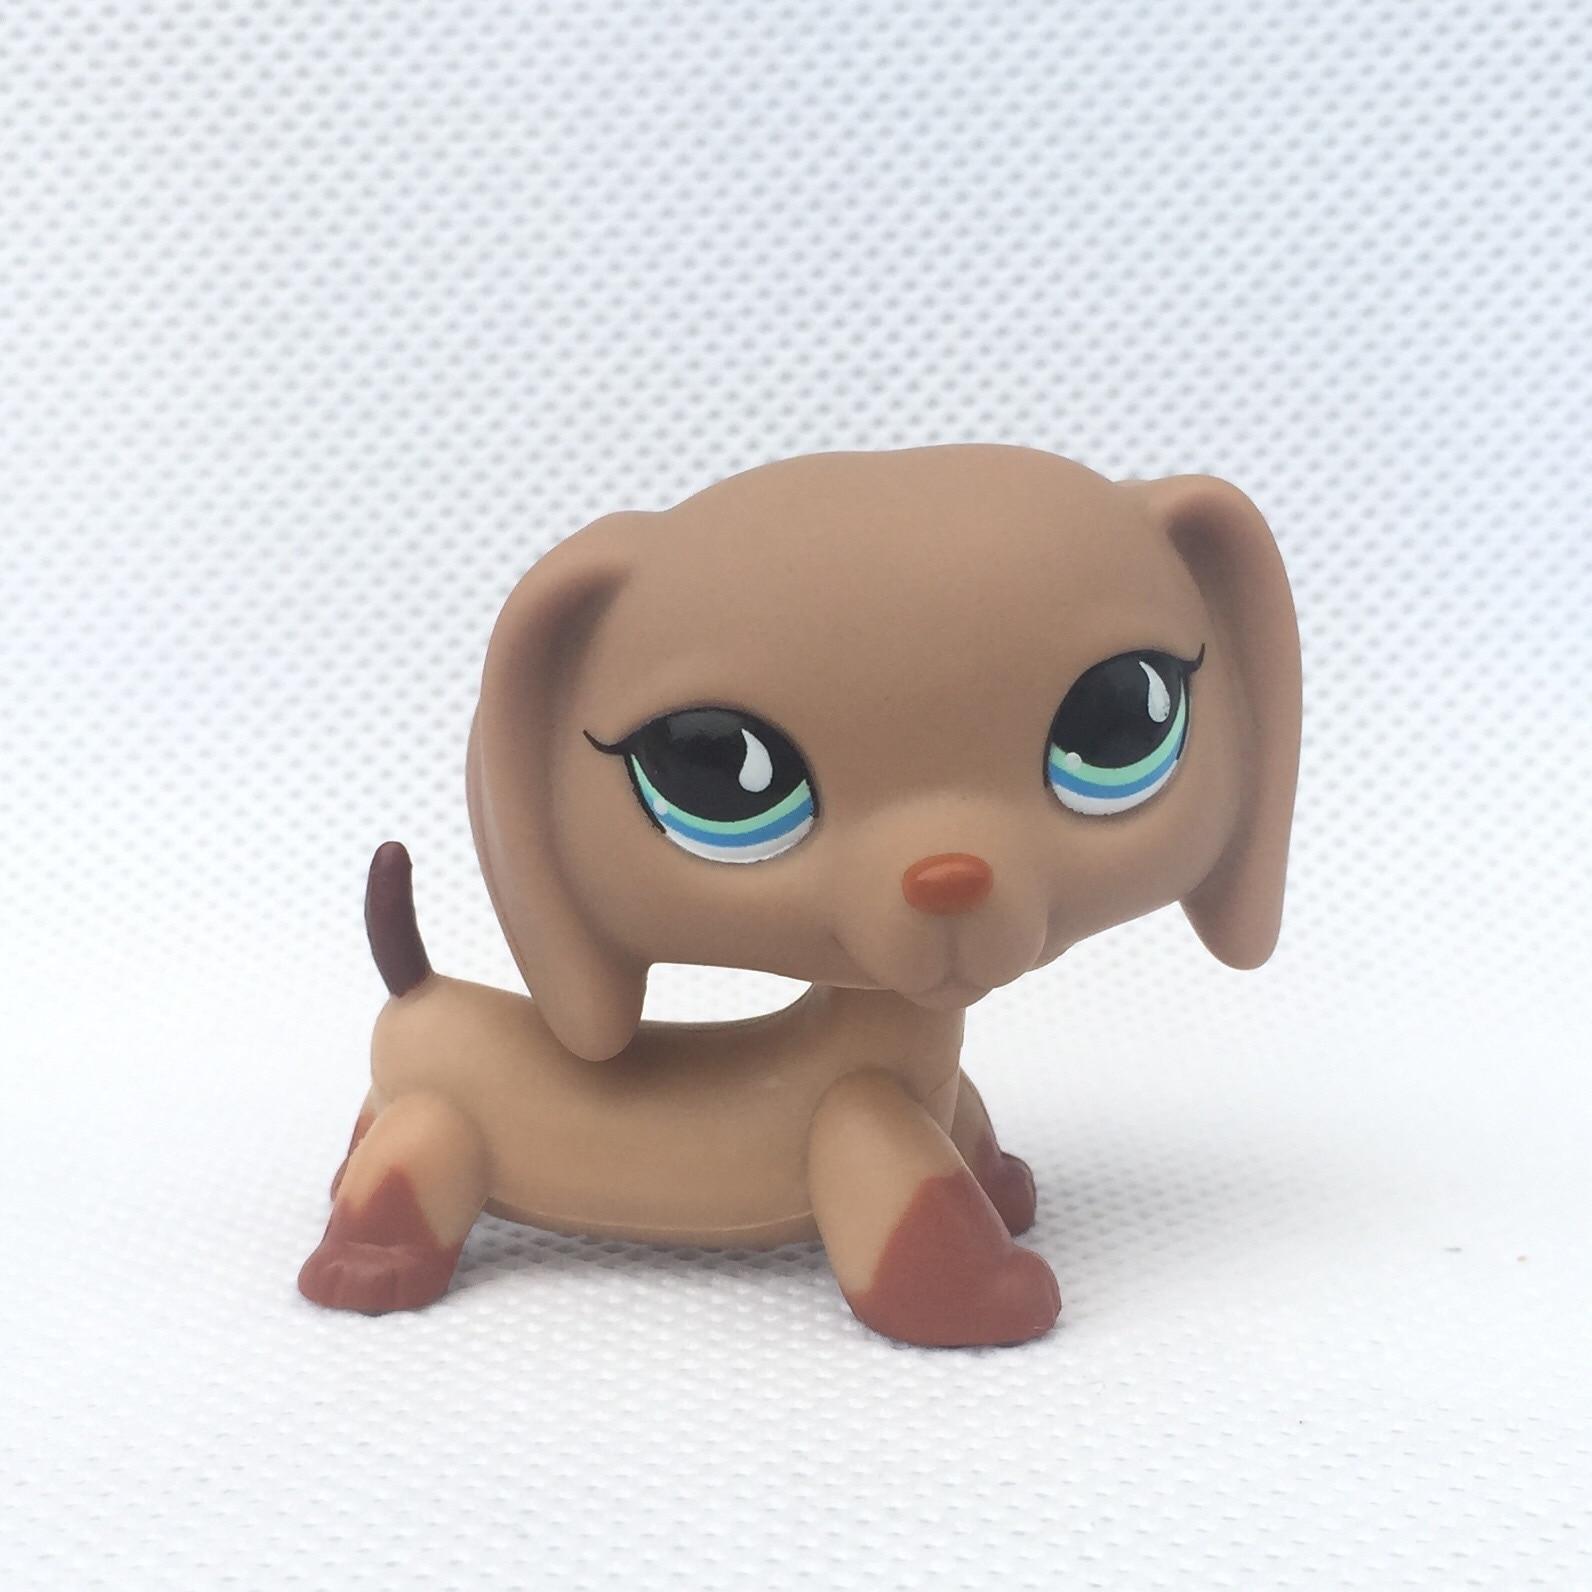 pet Collection figure Gift Dachshund Wiener Dog Teardrop blue Eyes 2 #518